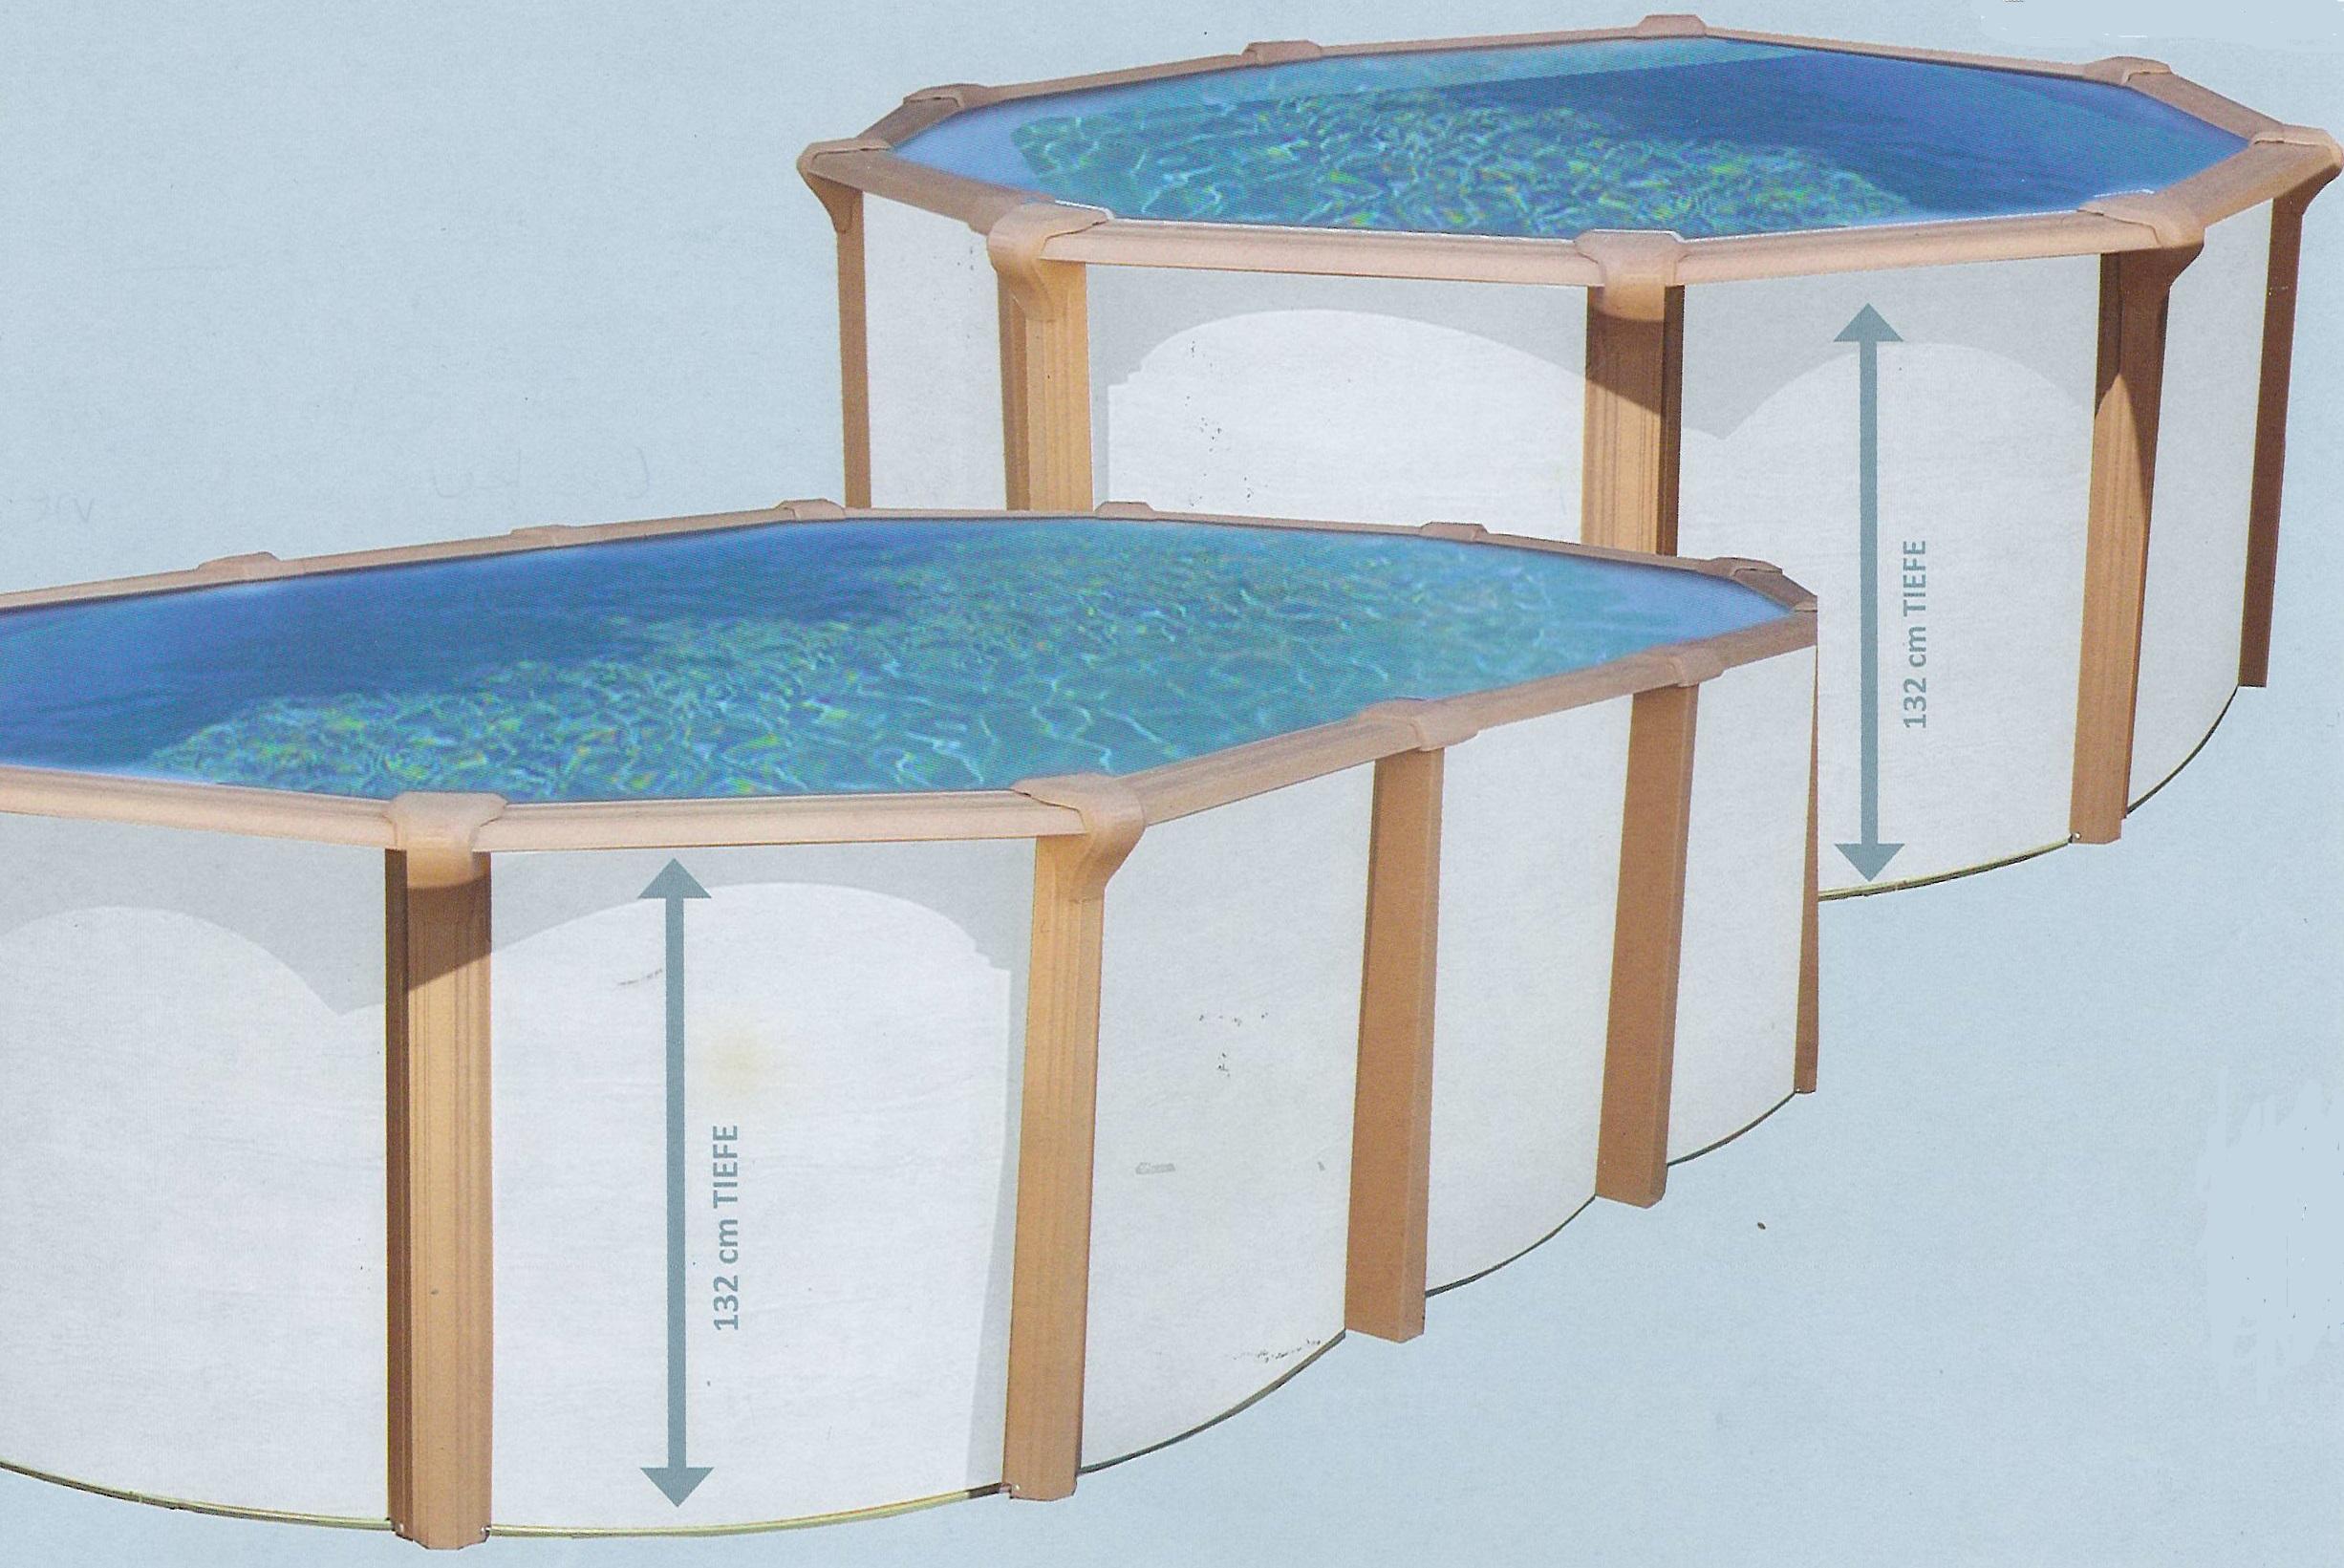 pool shop.at   Stahlwandbecken Premium oval 20,20x20,20m white wood ...